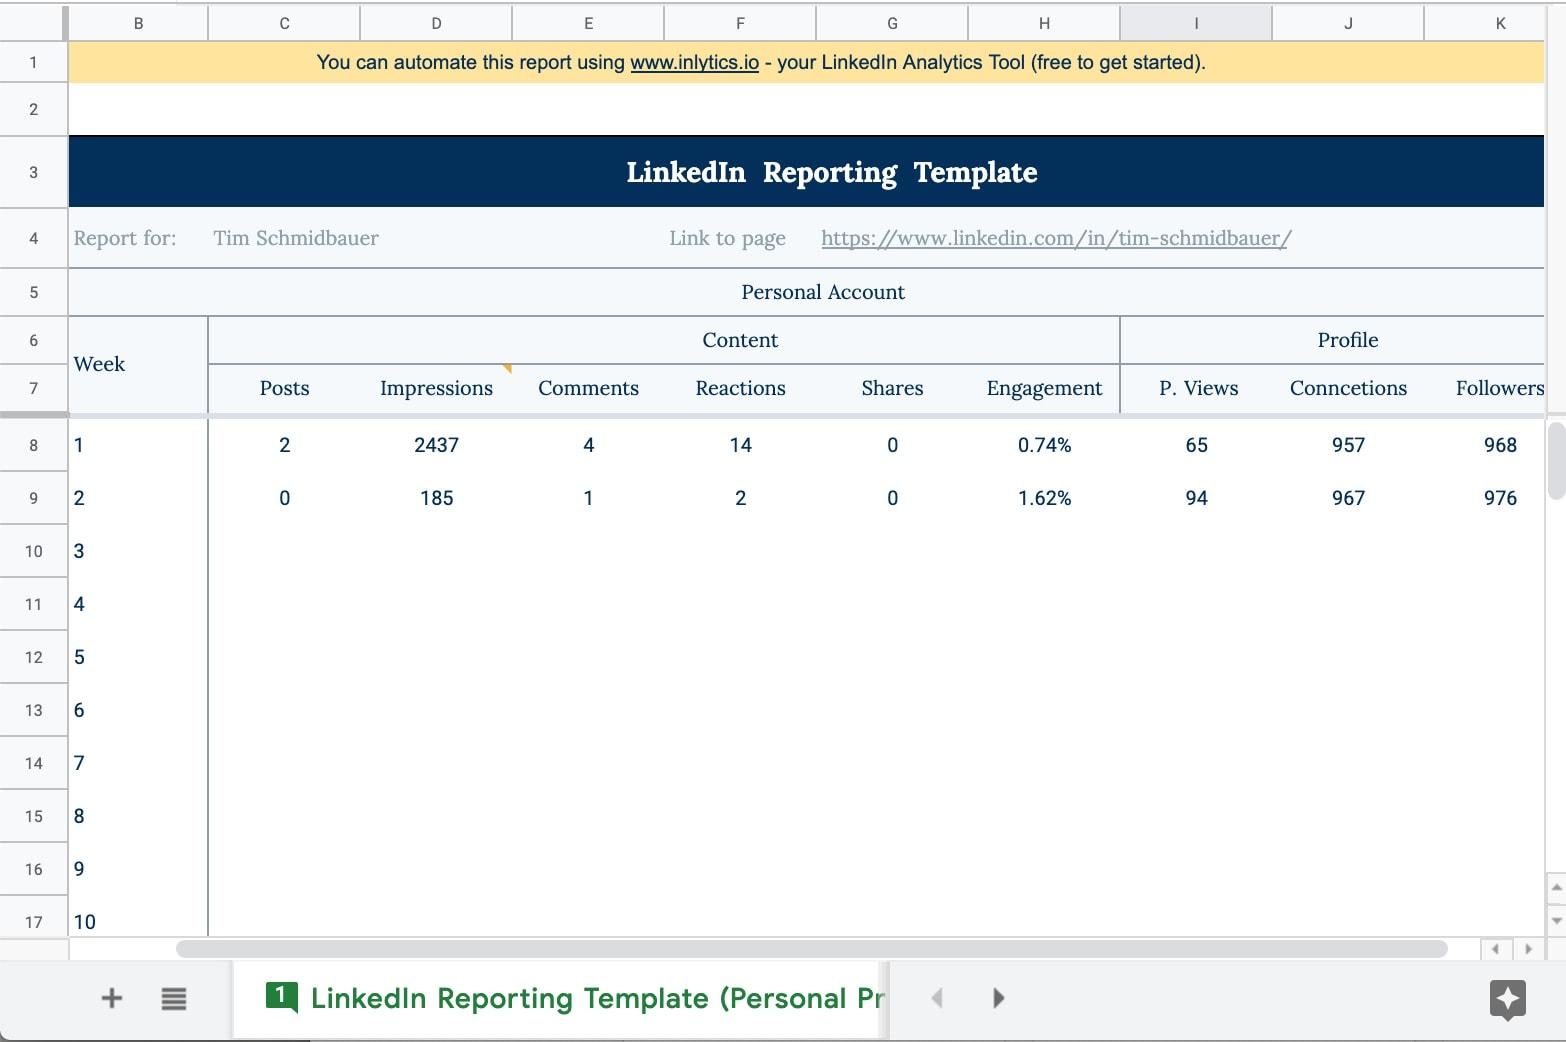 LinkedIn Analytics Reporting Template